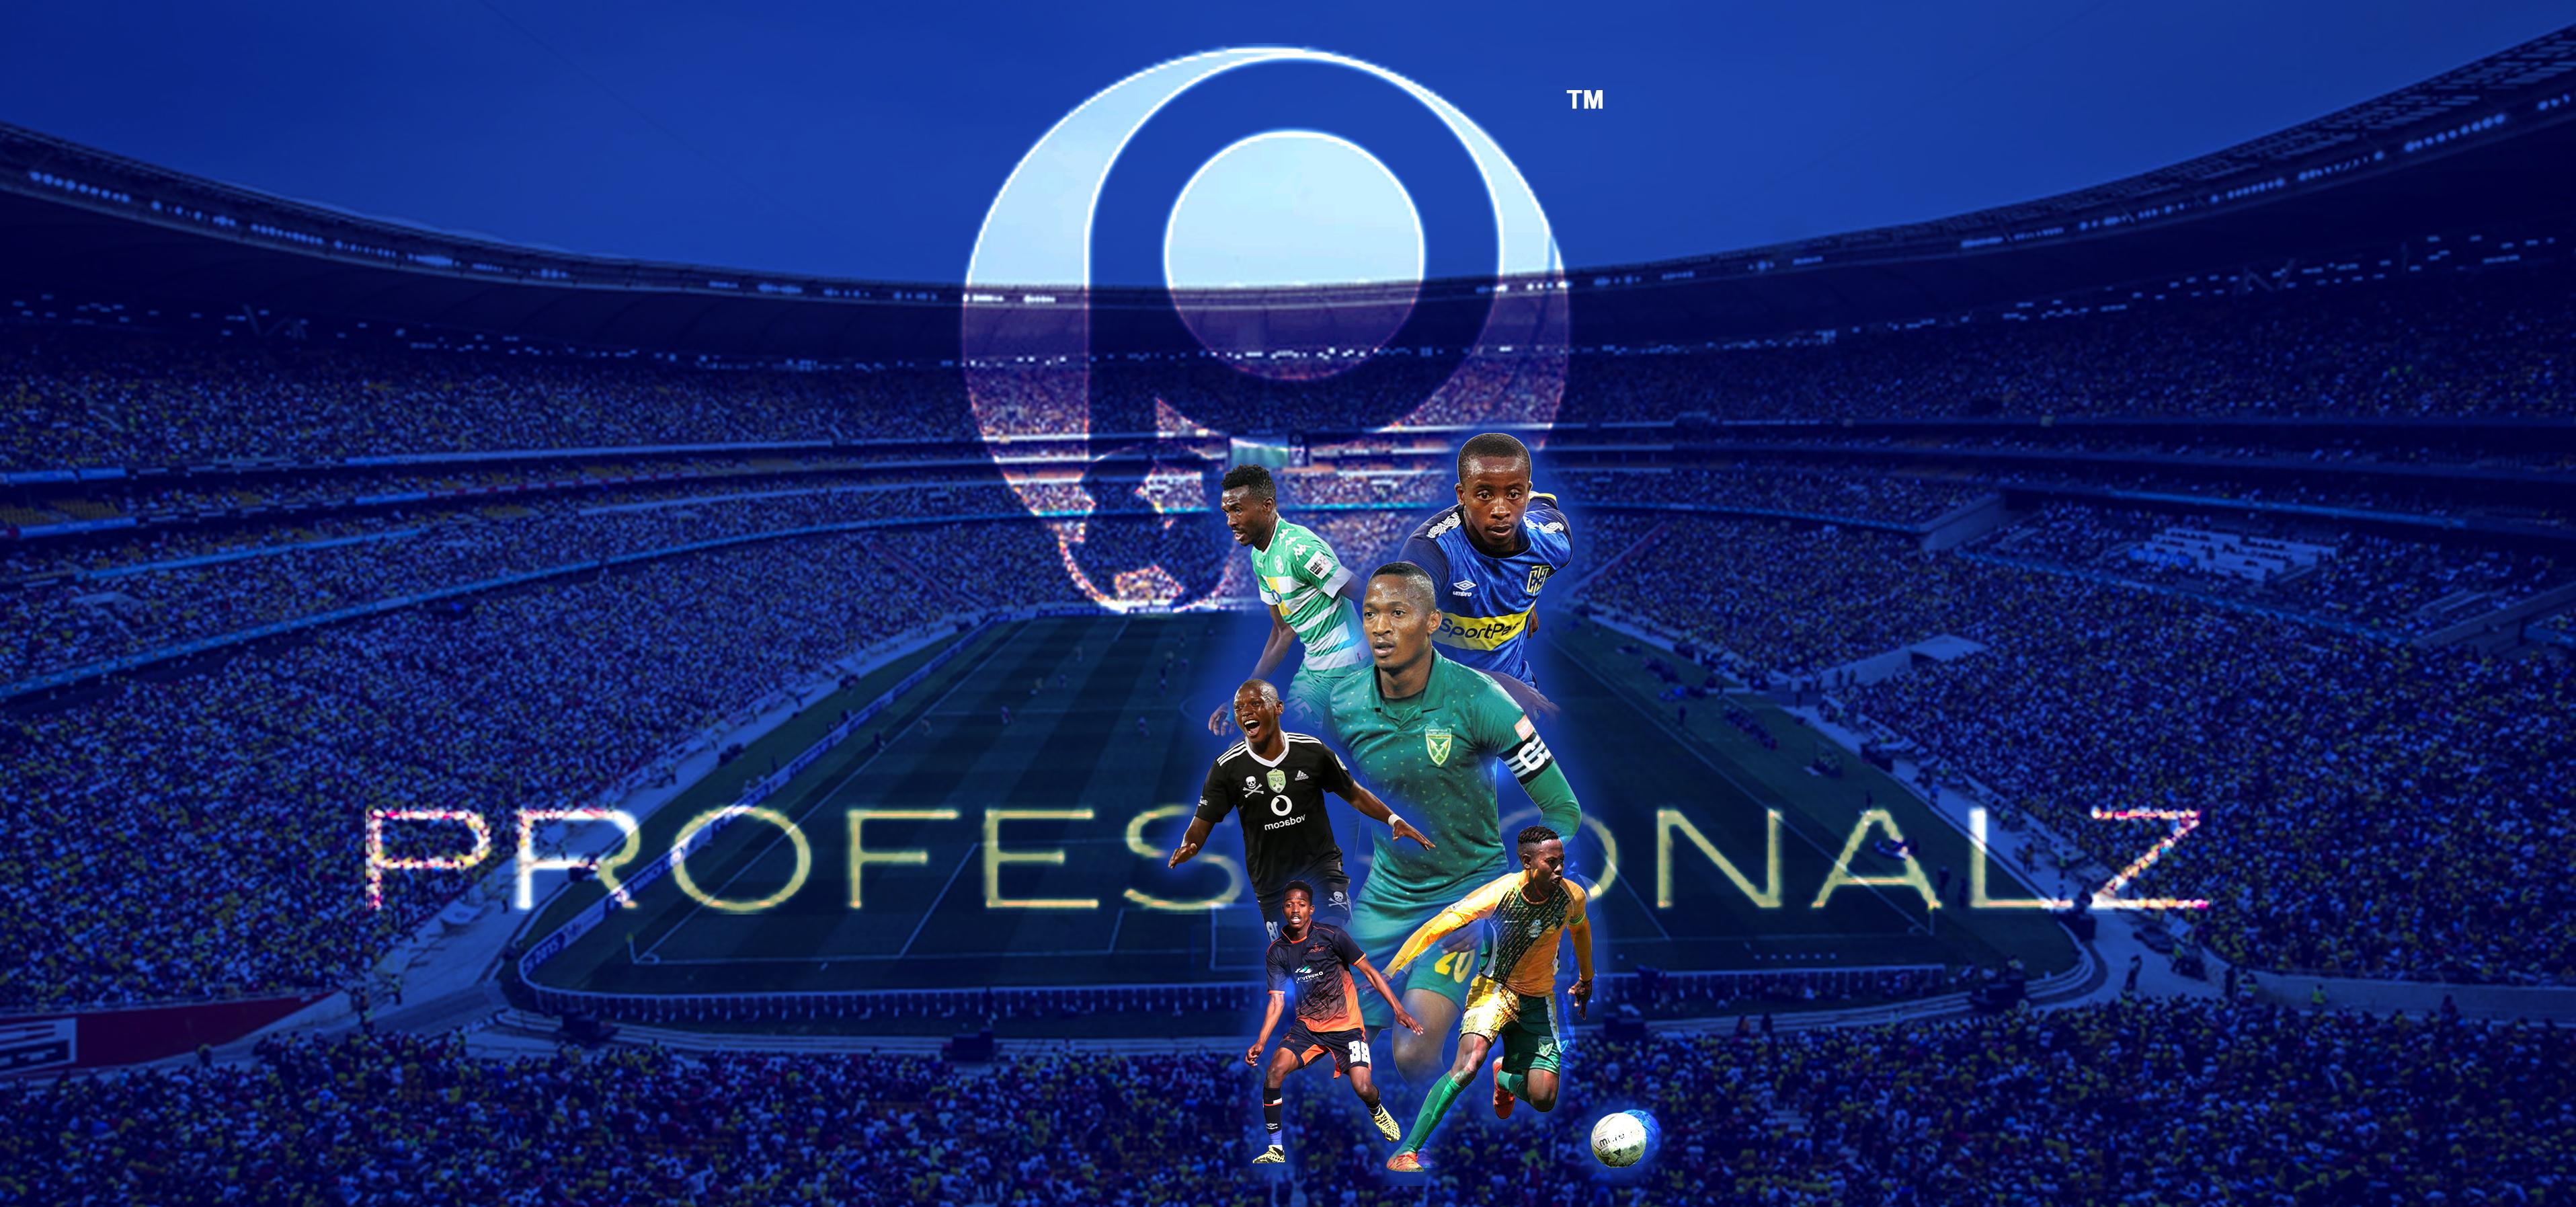 Soccer-Profile-00-1